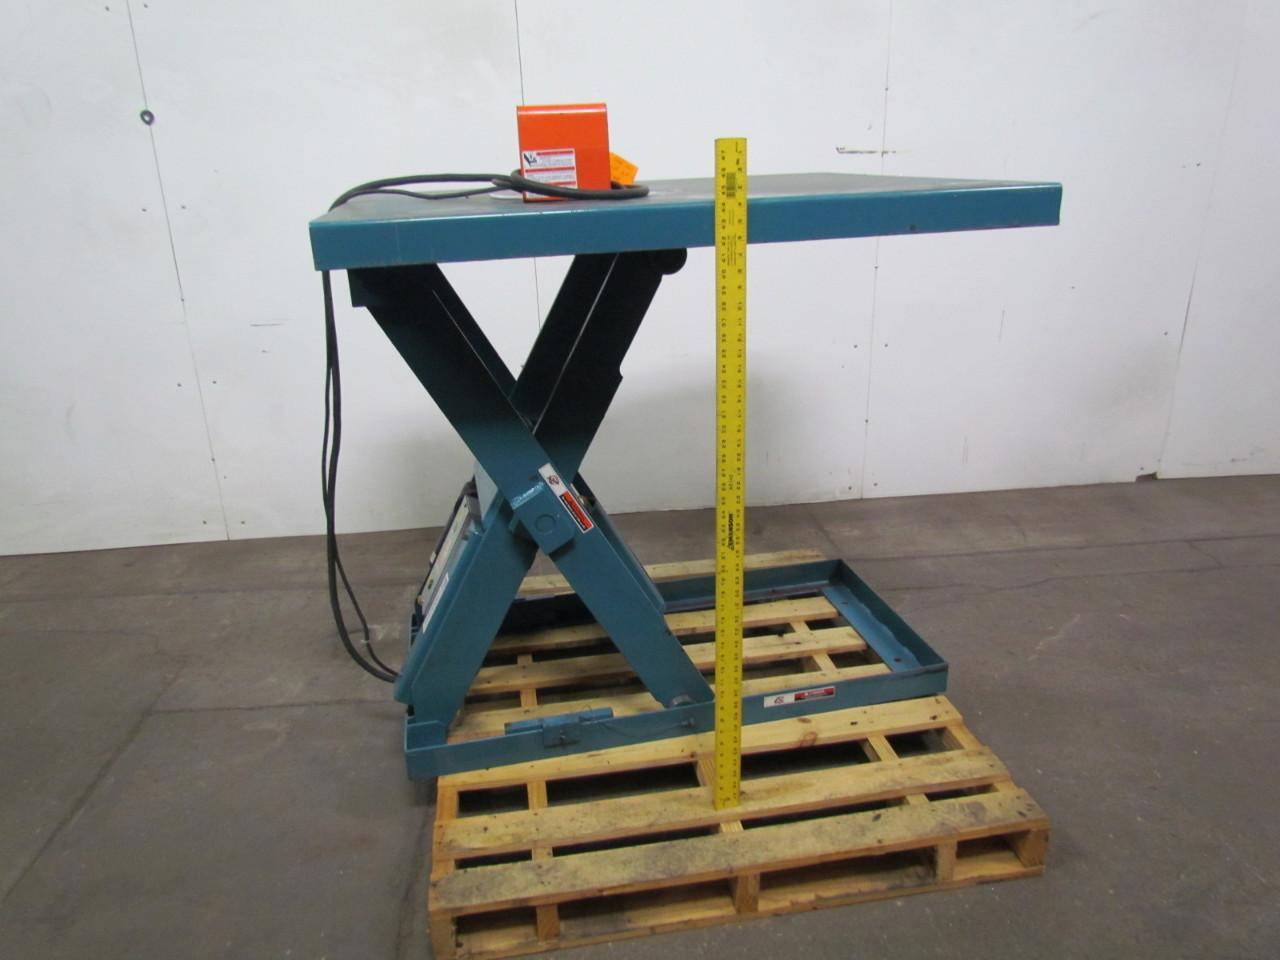 Used Hydraulic Lift Tables : Advance lifts p tz hydraulic scissor lift table lb